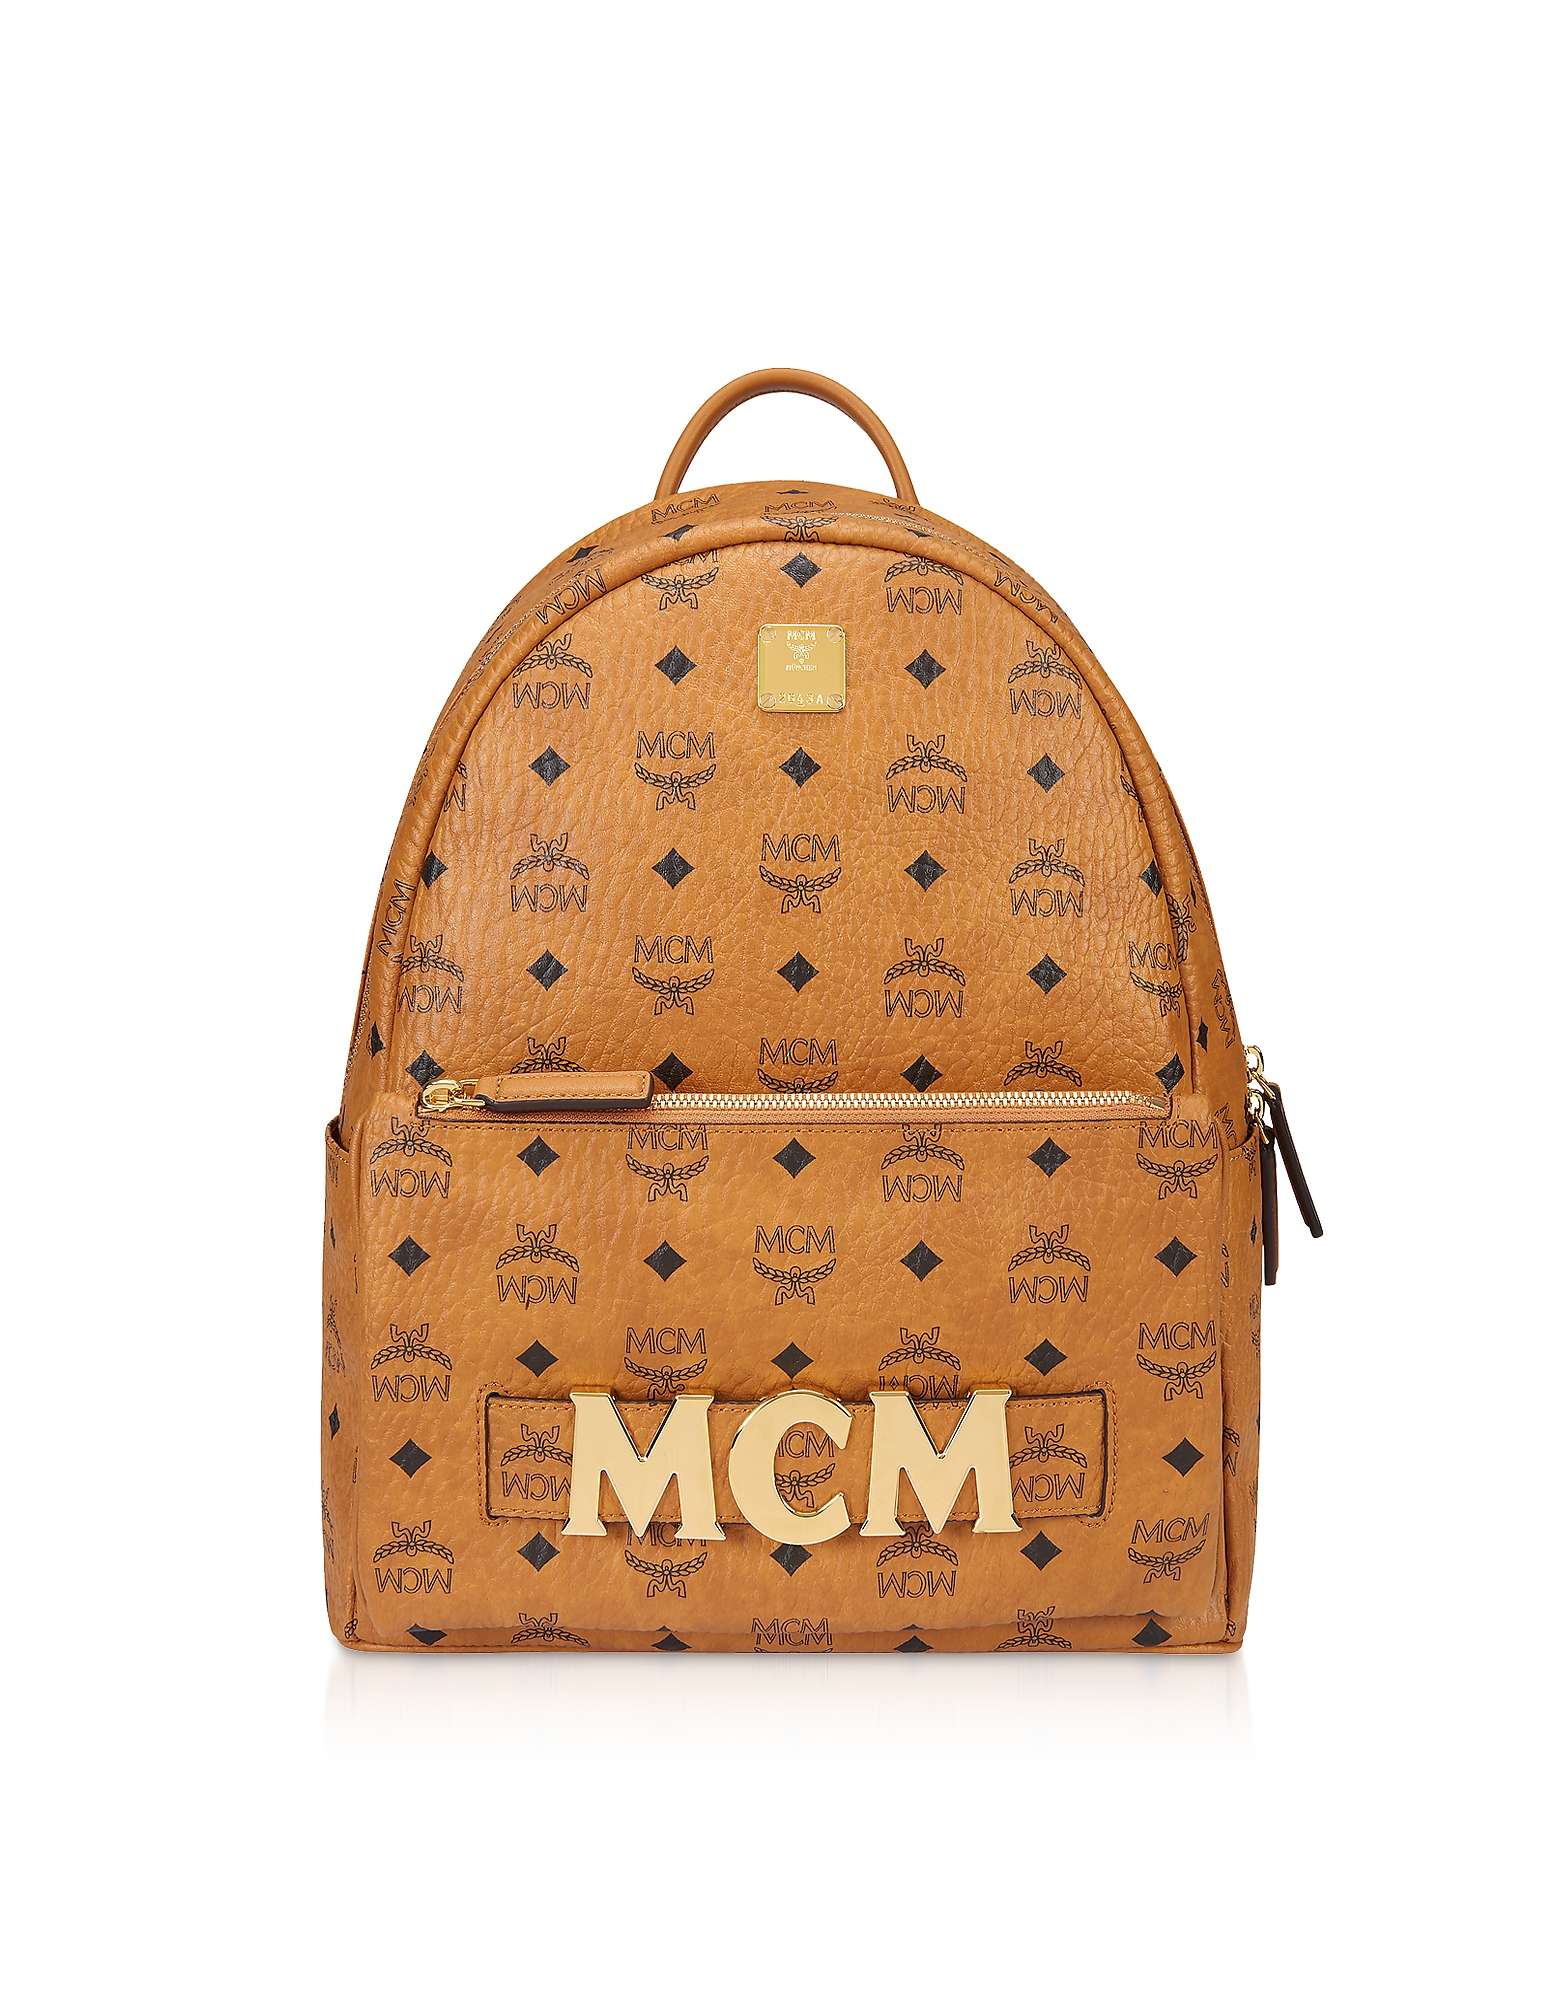 Cognac Trilogie Stark Small/Medium Backpack